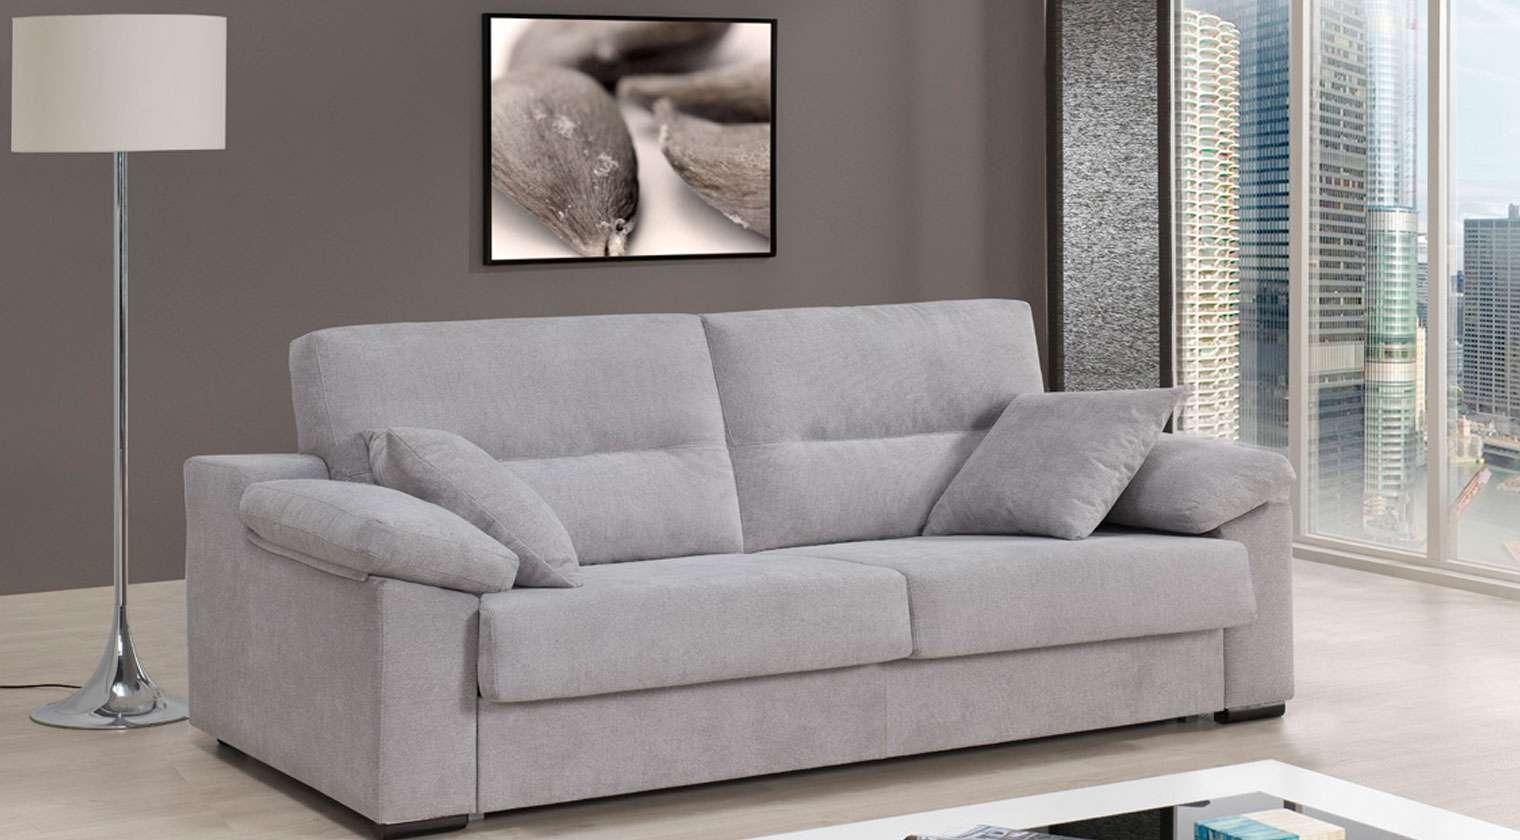 Sof cama diva sofas cama convertibles for Sofa cama extensible